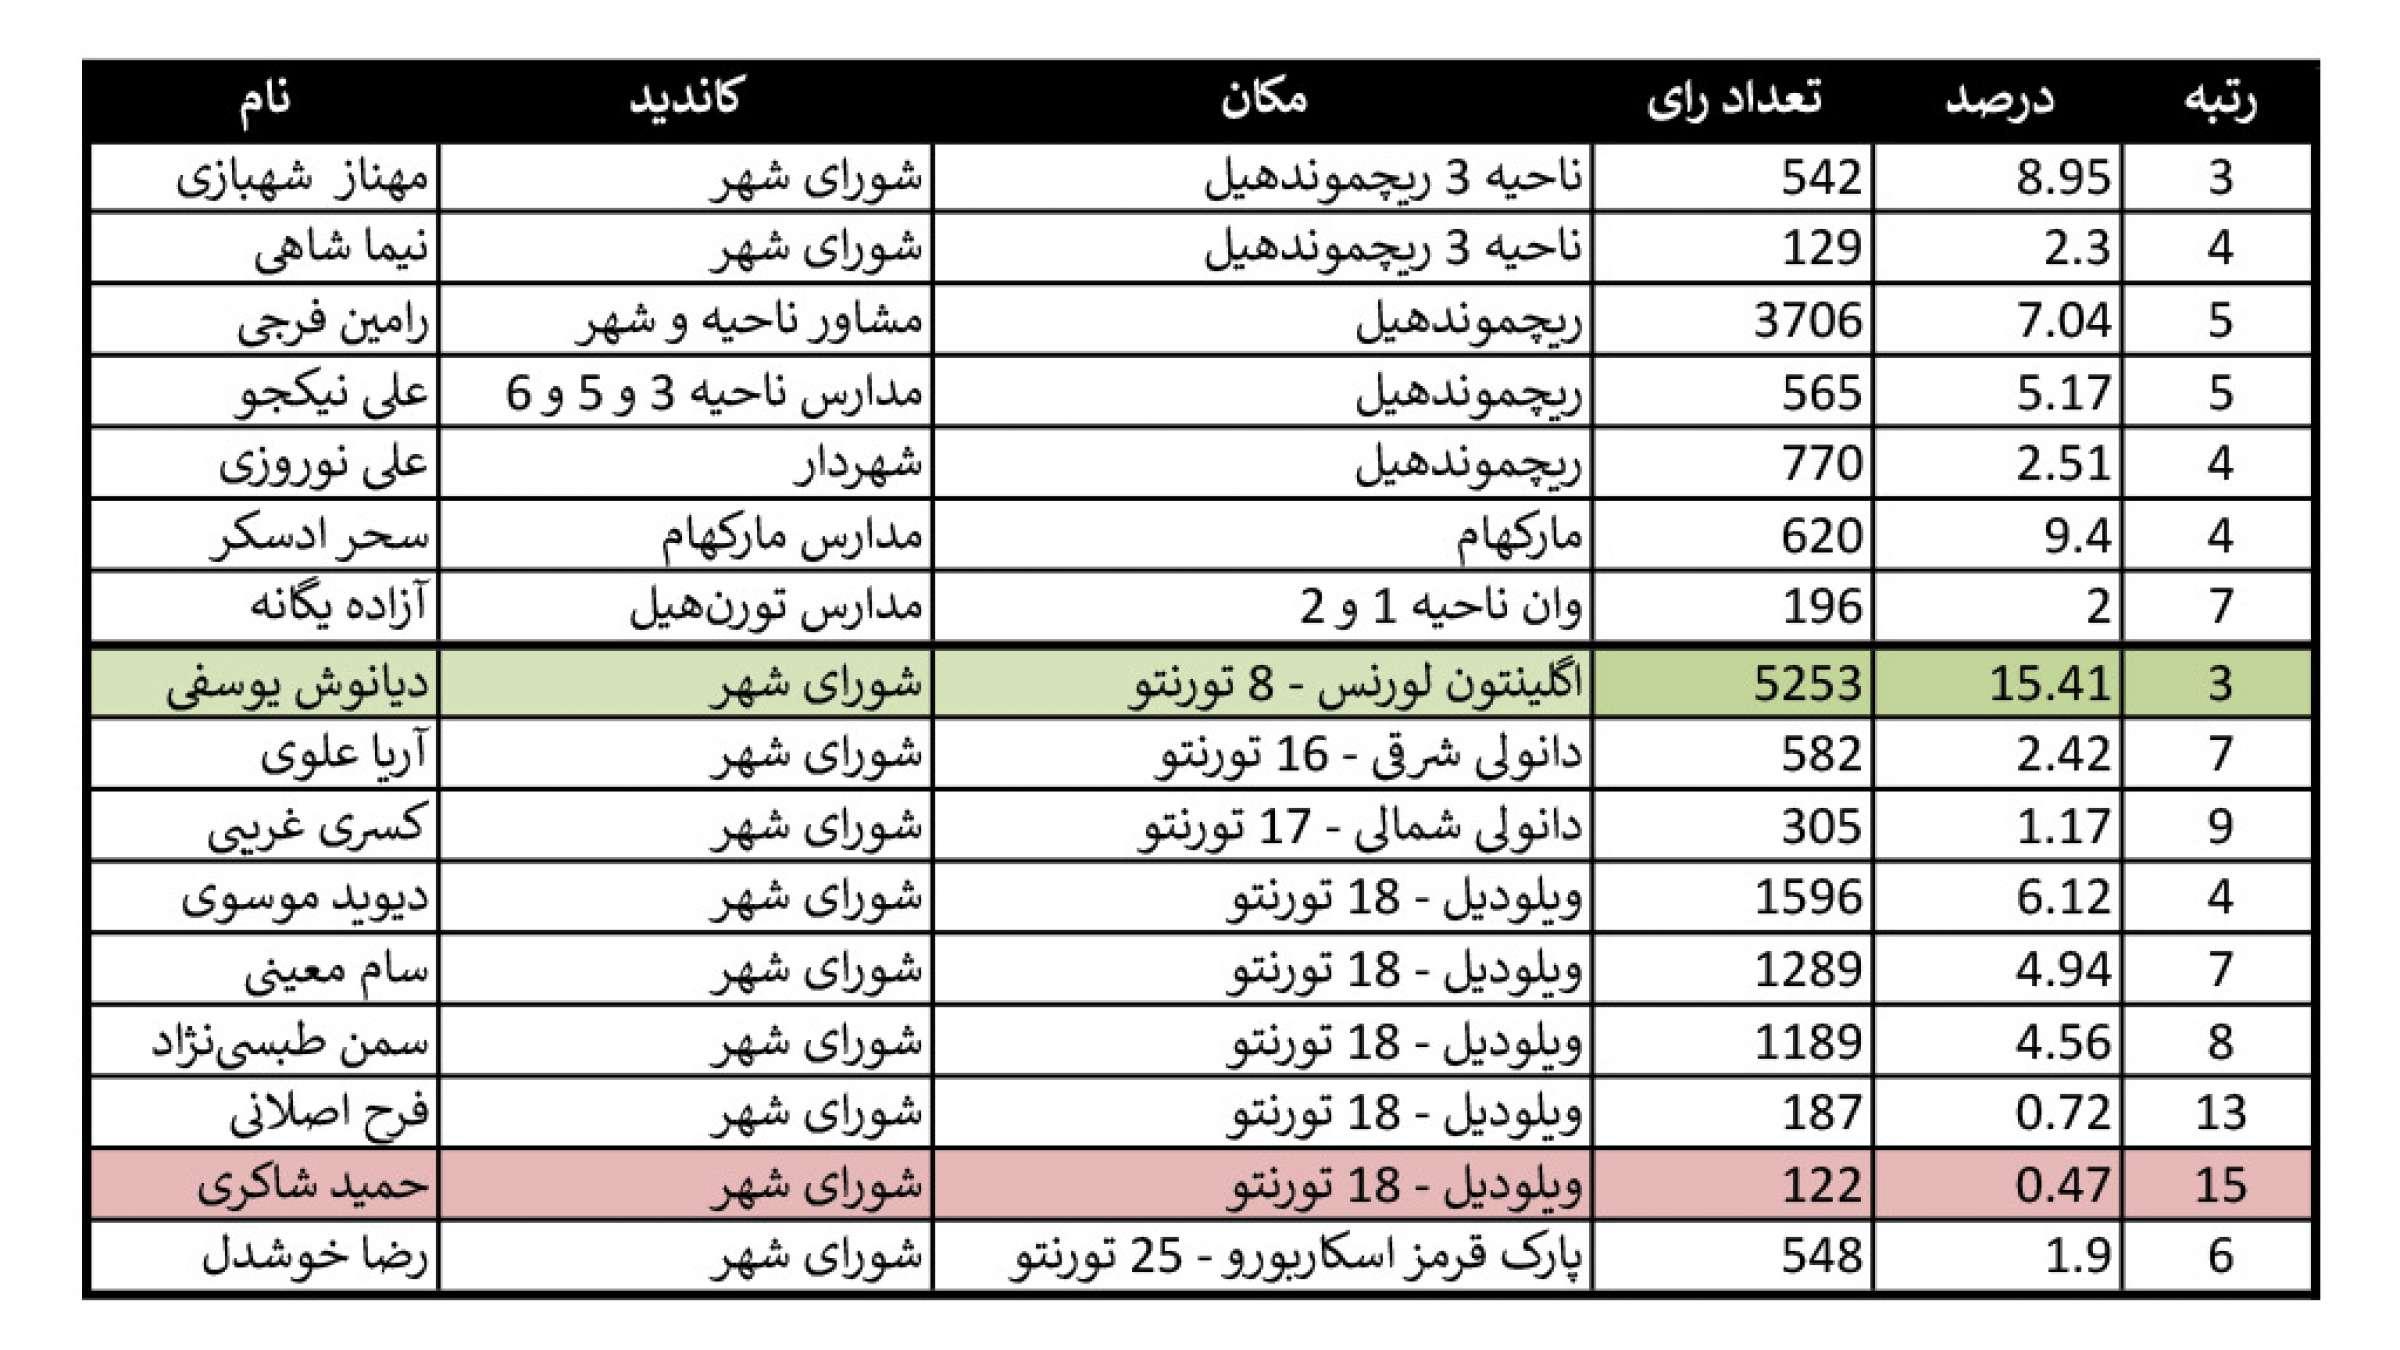 saeed-soltanpour-city-iranians-chart